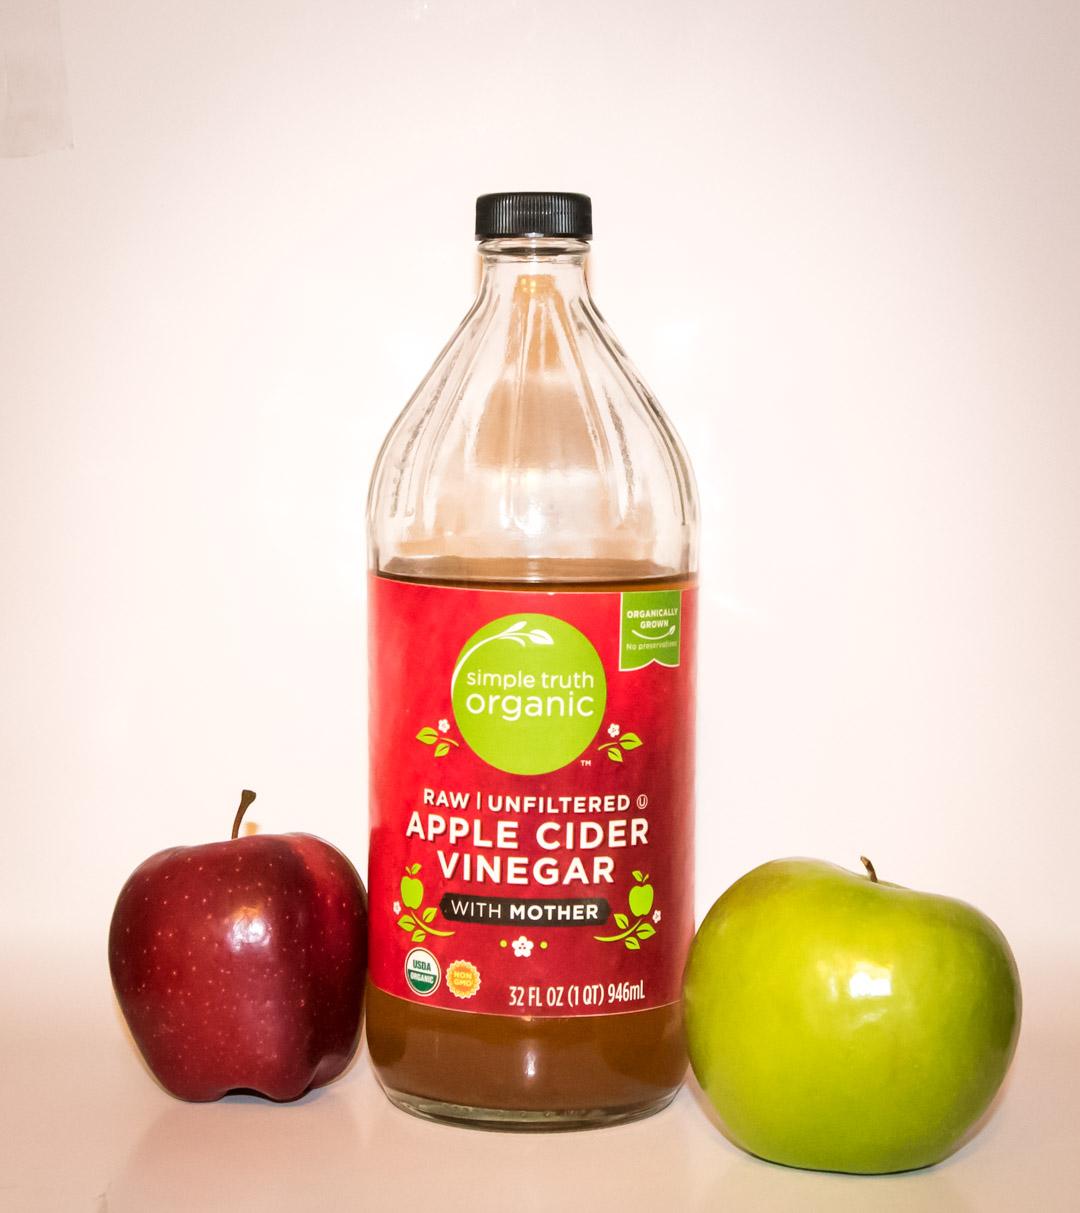 Apple Cider Vinegar, drink recipe, fitness, nutrition, probitics, gut health, digestive health